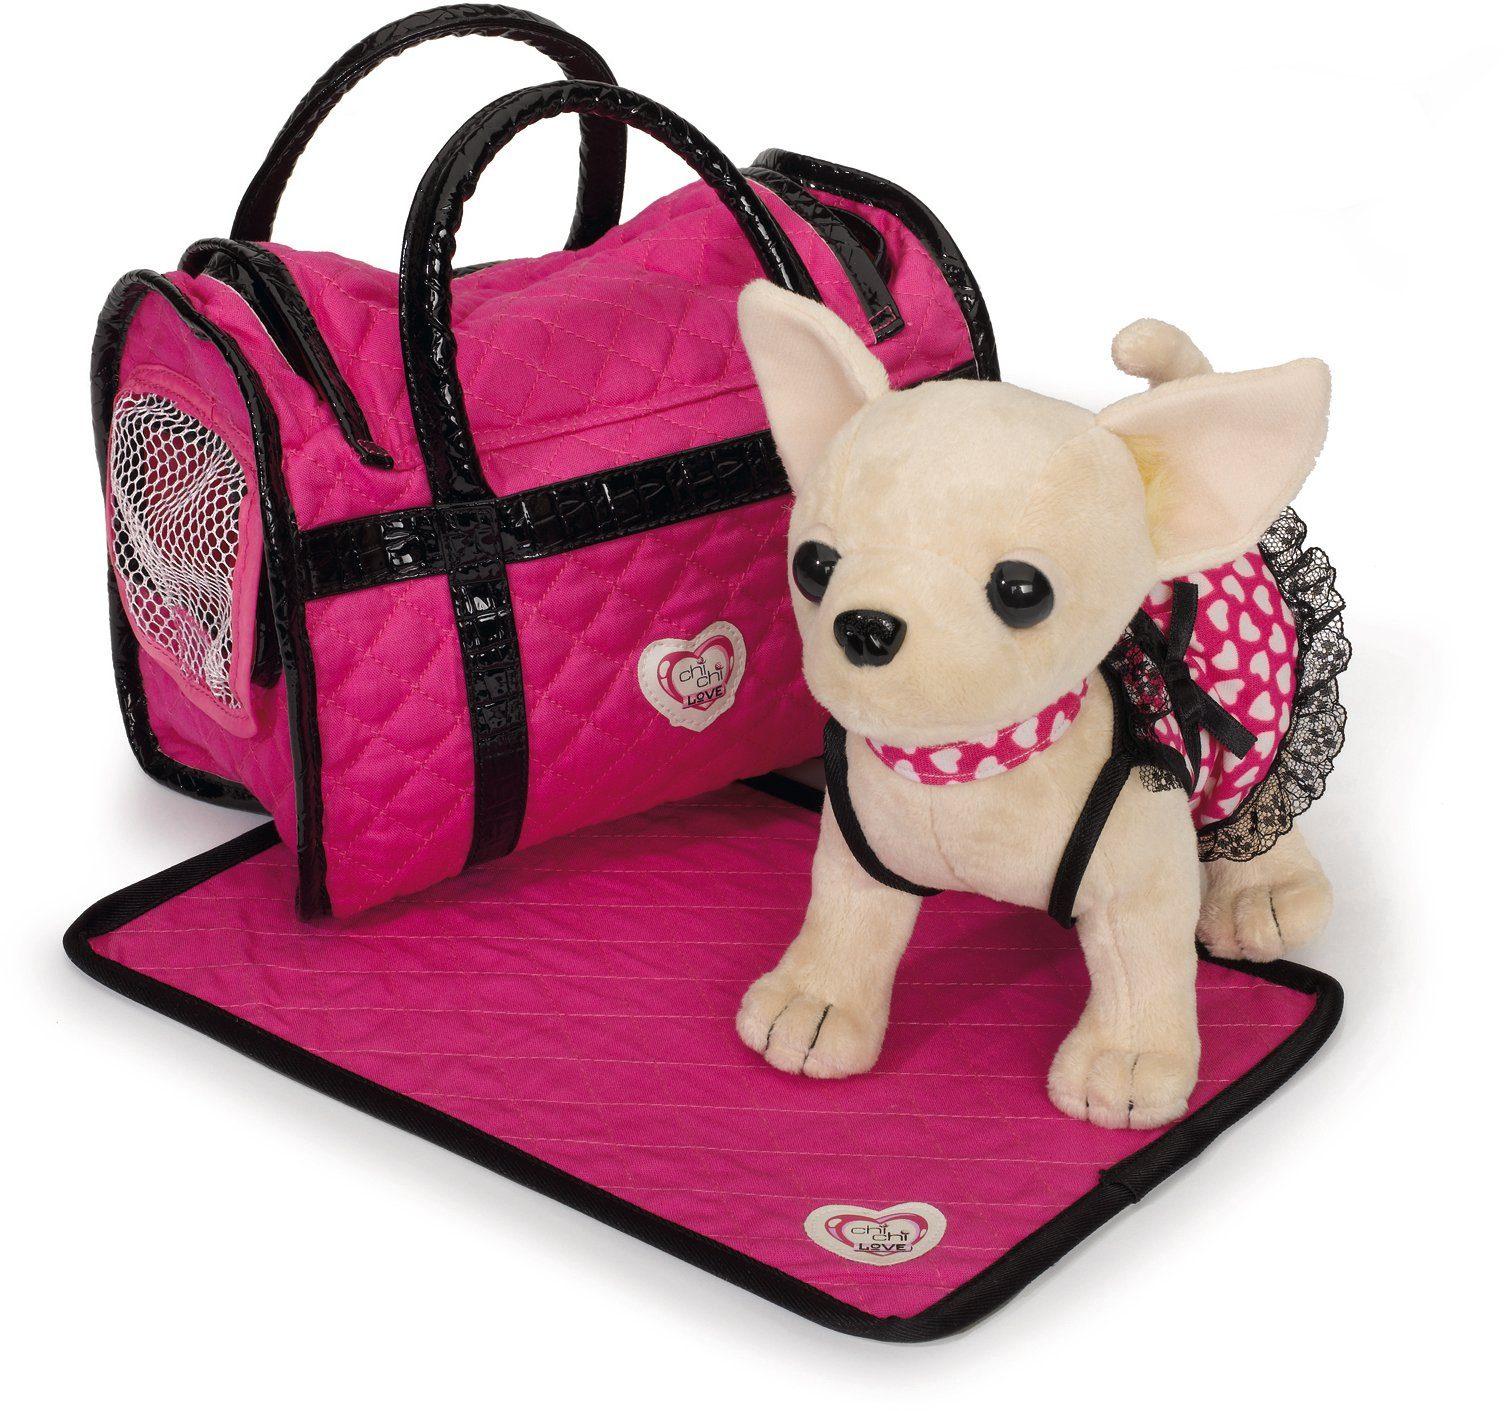 Simba Stofftier mit Tasche ca. 20 cm, »Chi Chi Love, Chihuahua Plüschhund Paris II«